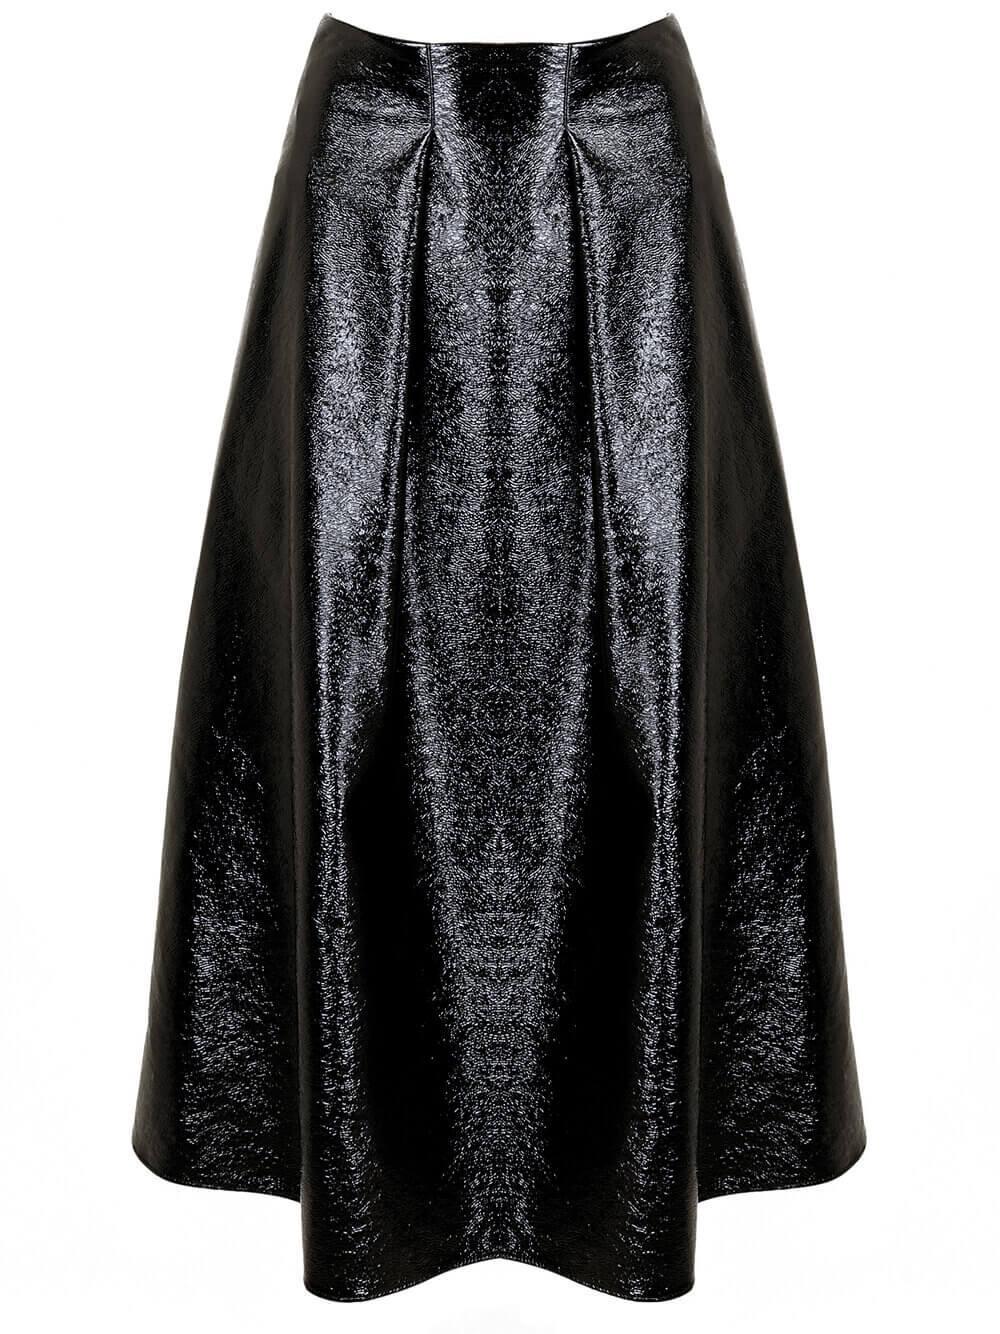 Alexis Patent Skirt